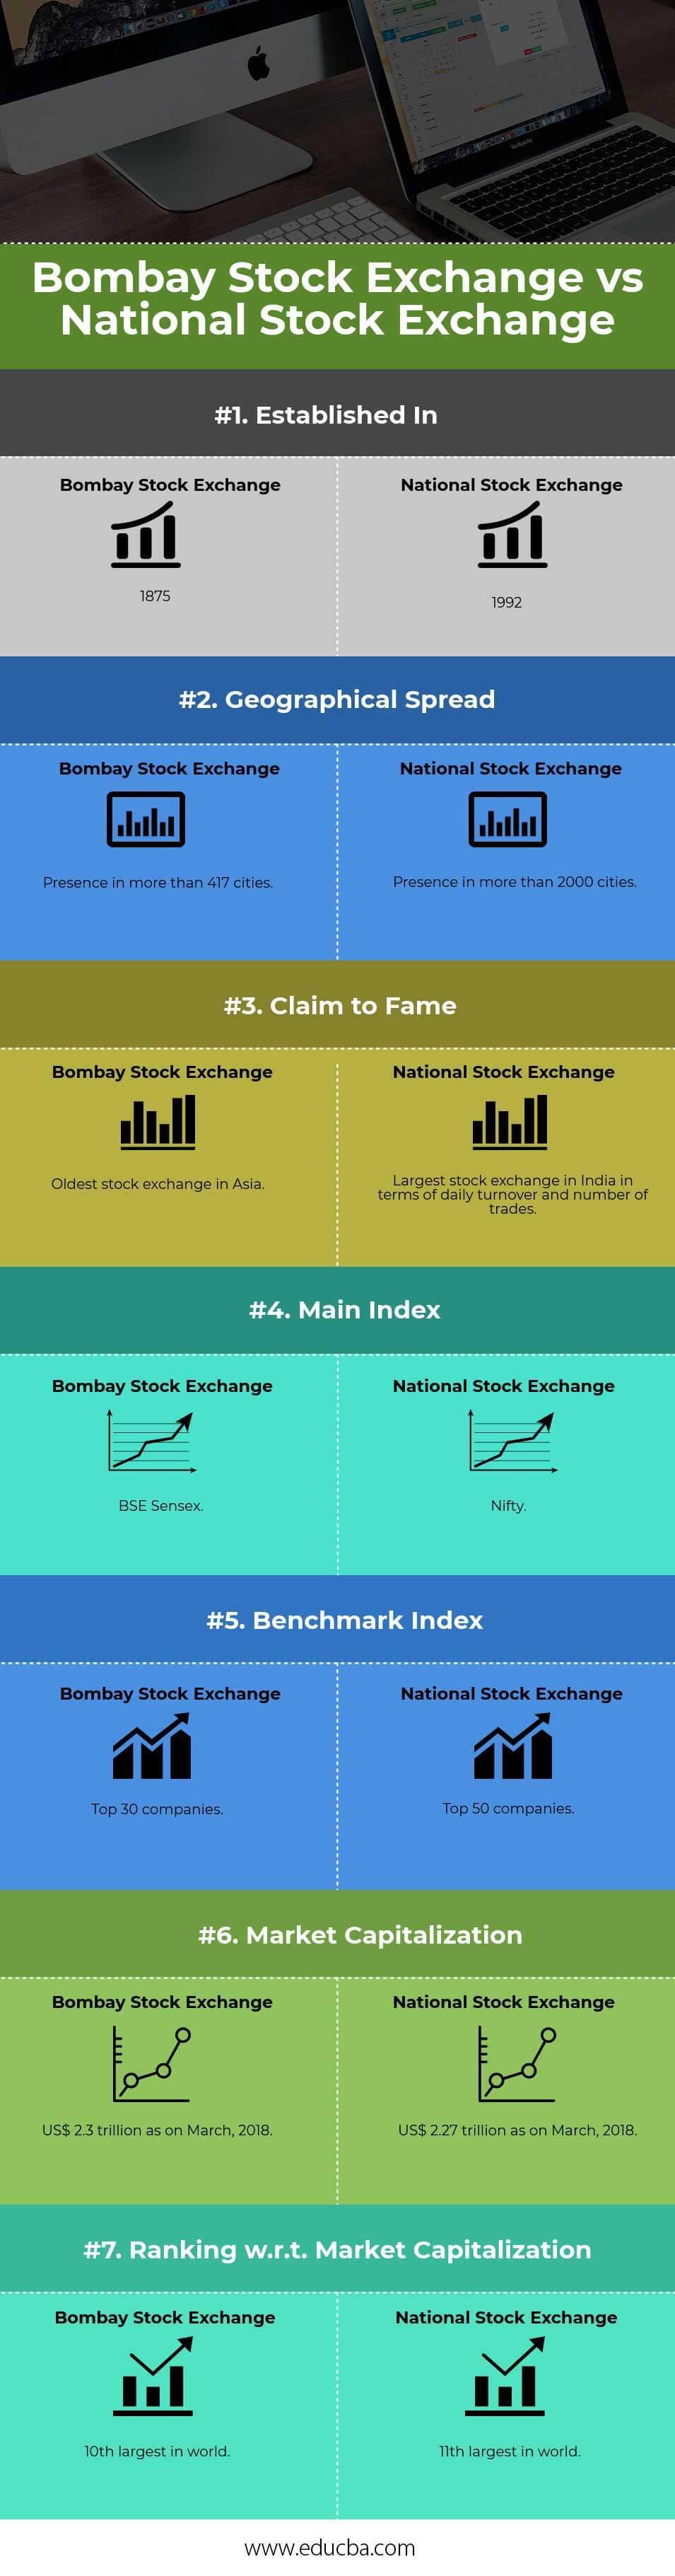 Bombay-Stock-Exchange-vs-National-Stock-Exchange